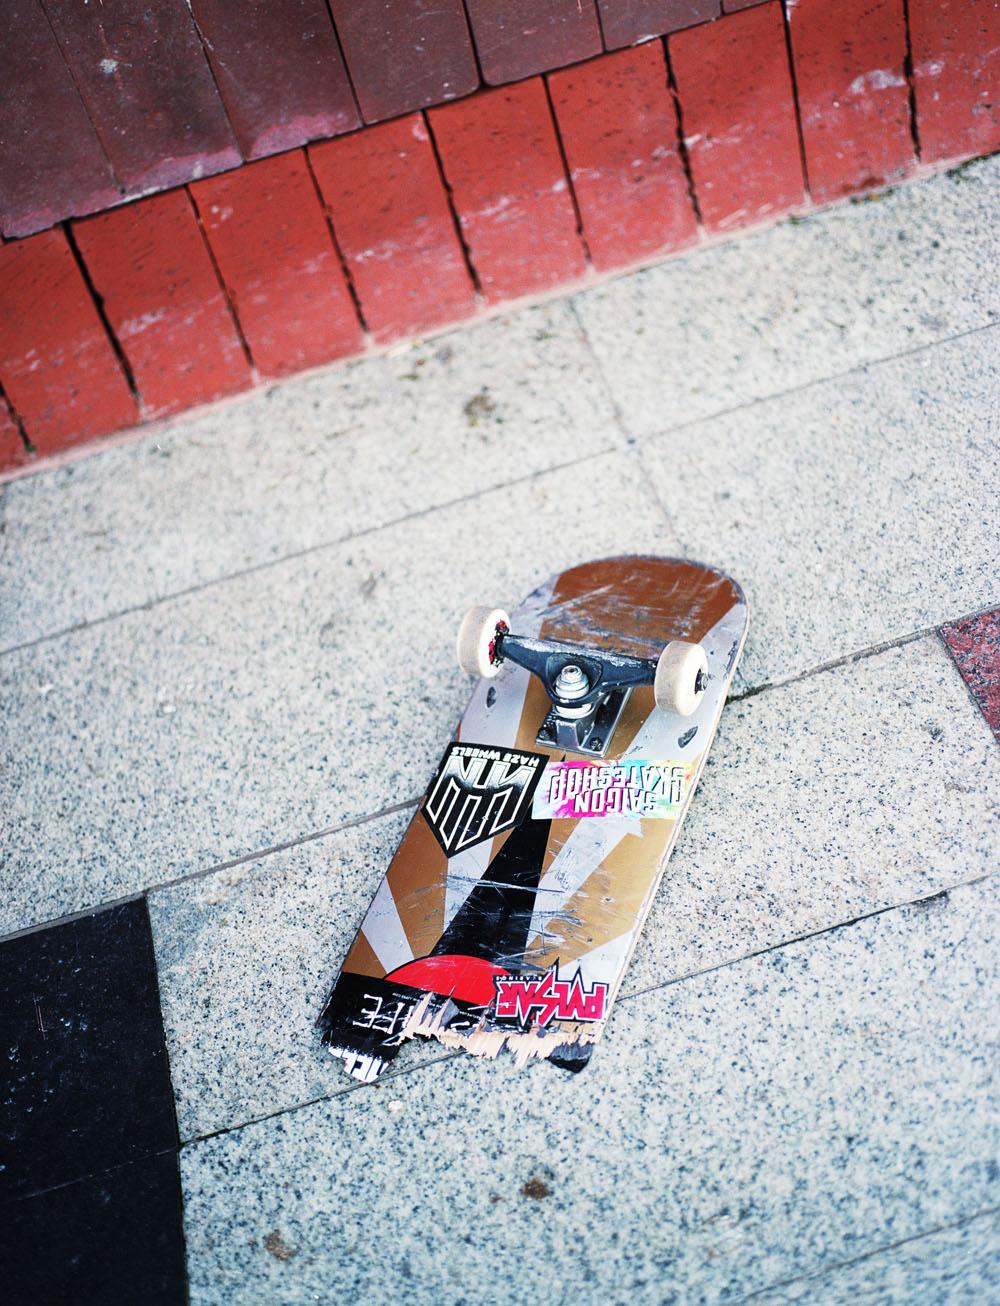 Creteil_Skate_1.jpg